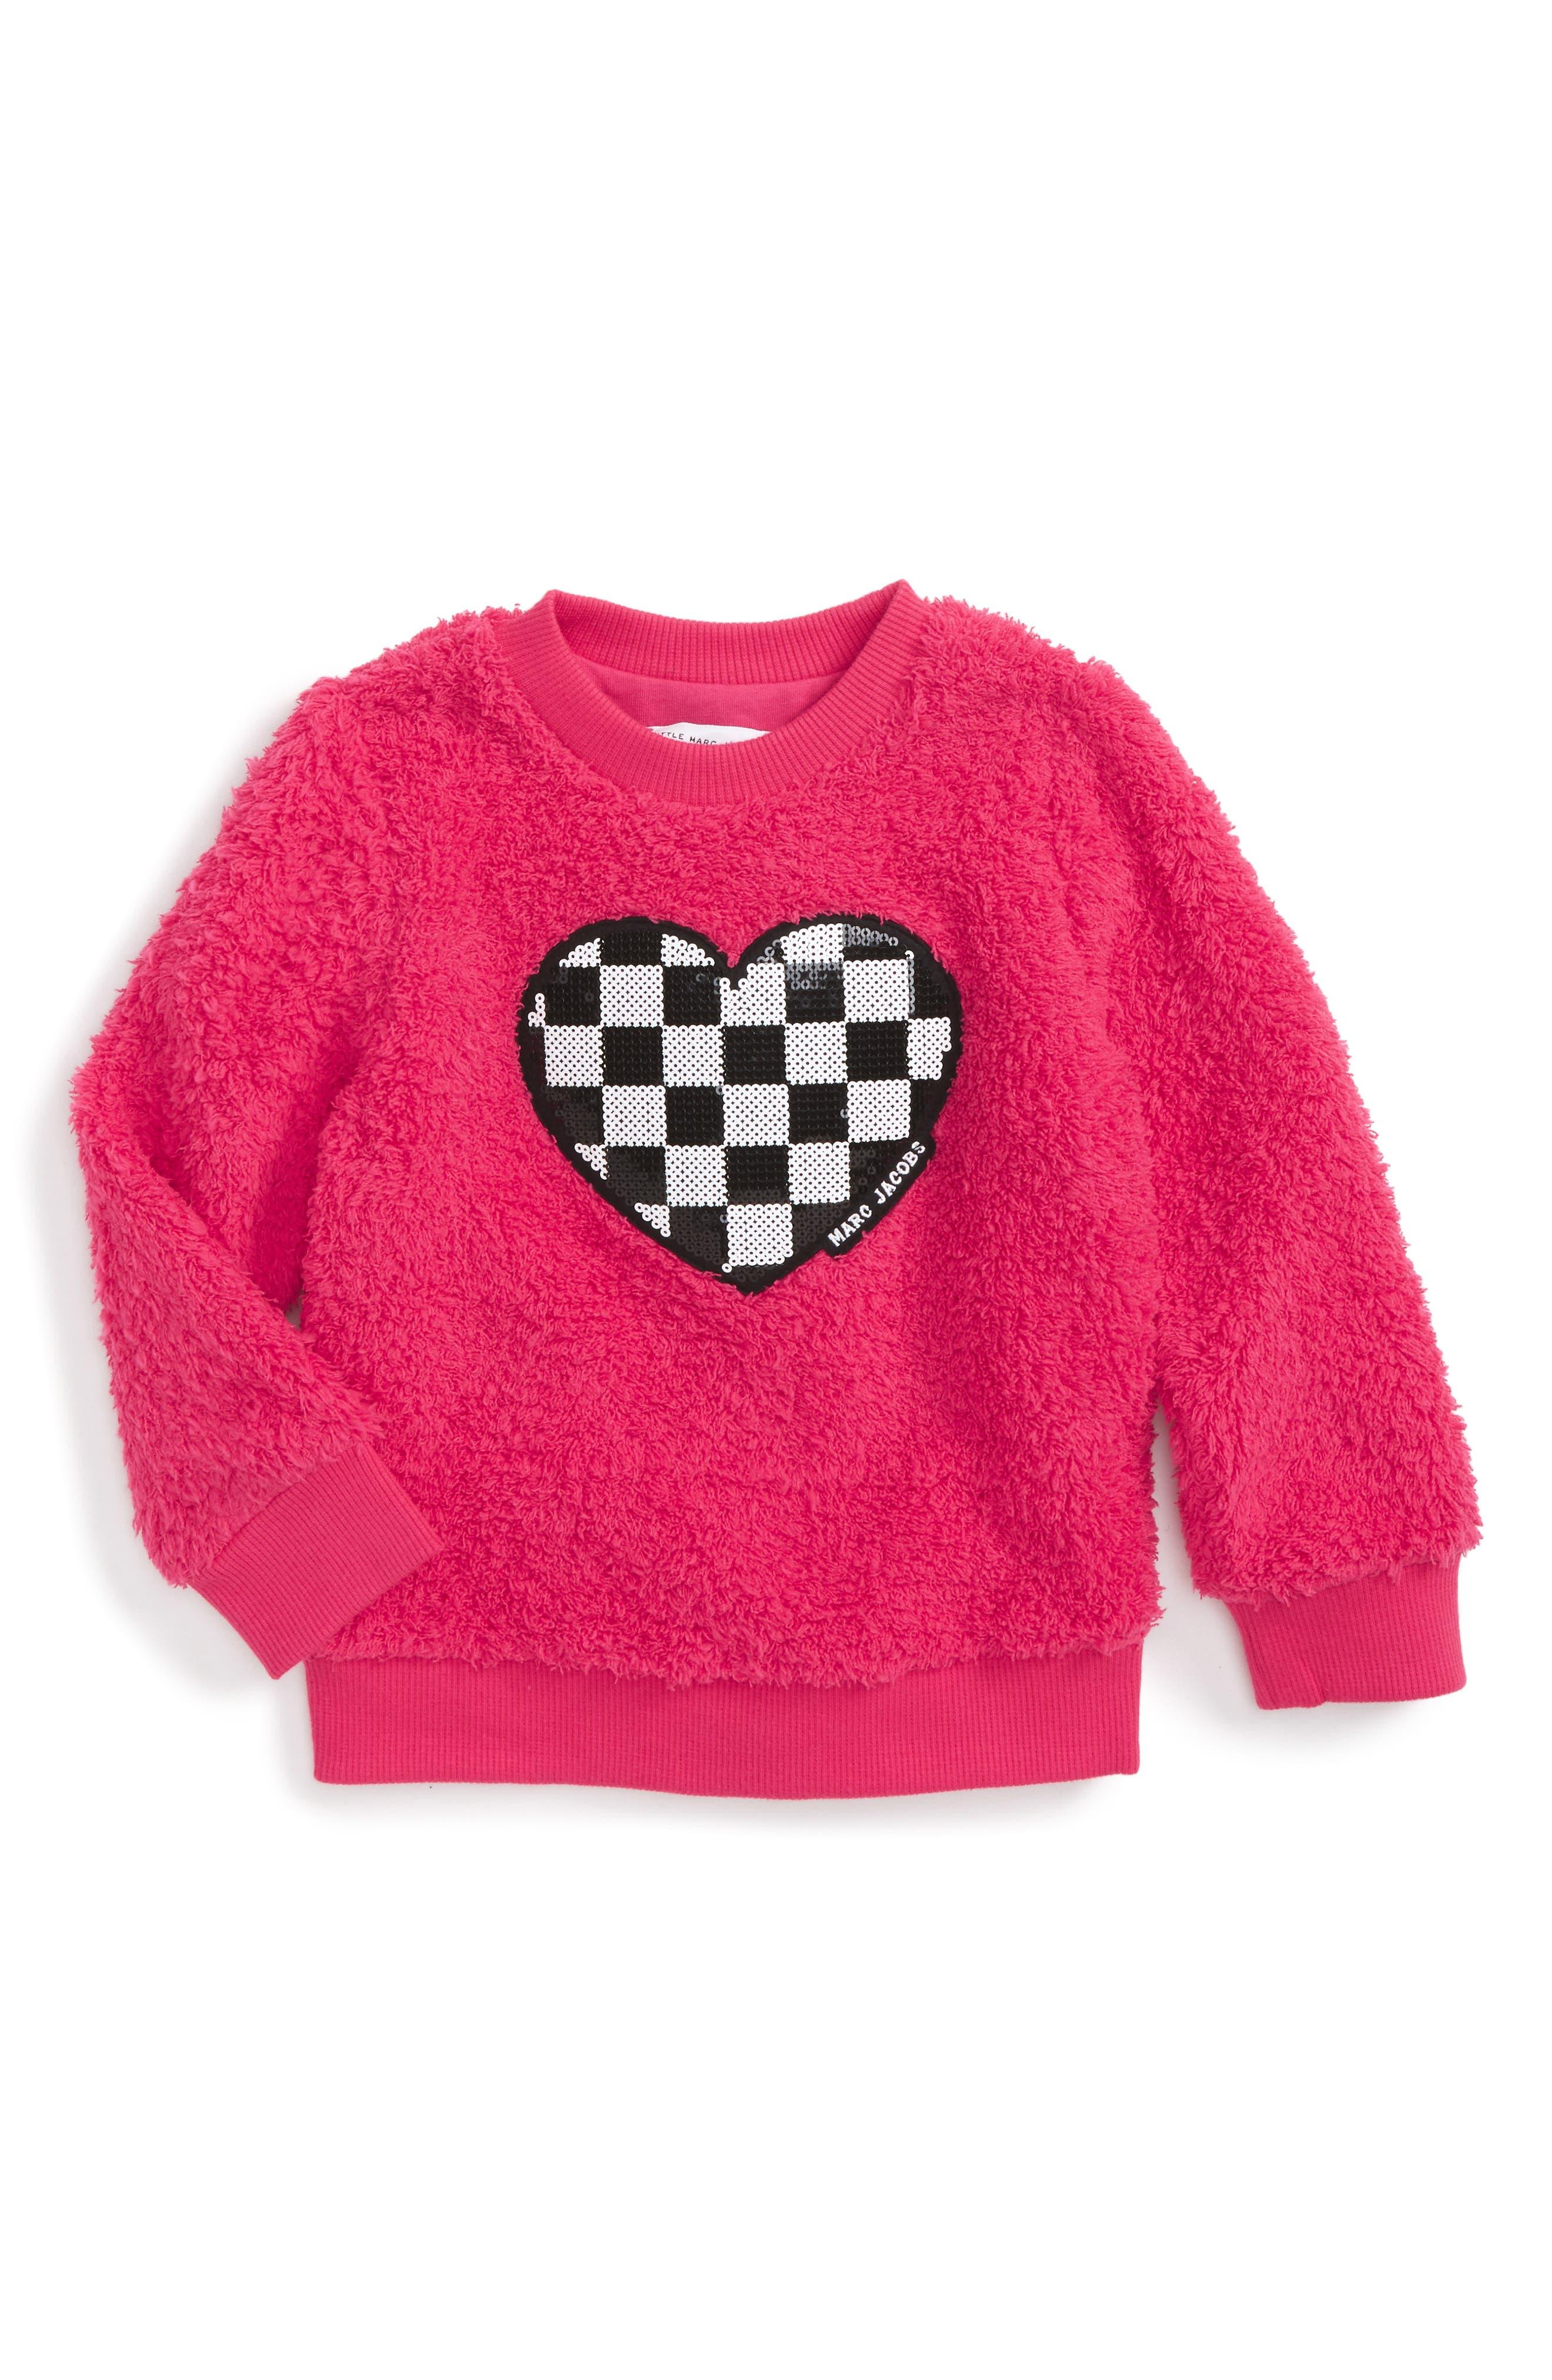 Sequin Heart Fuzzy Sweatshirt,                         Main,                         color, Bright Pink